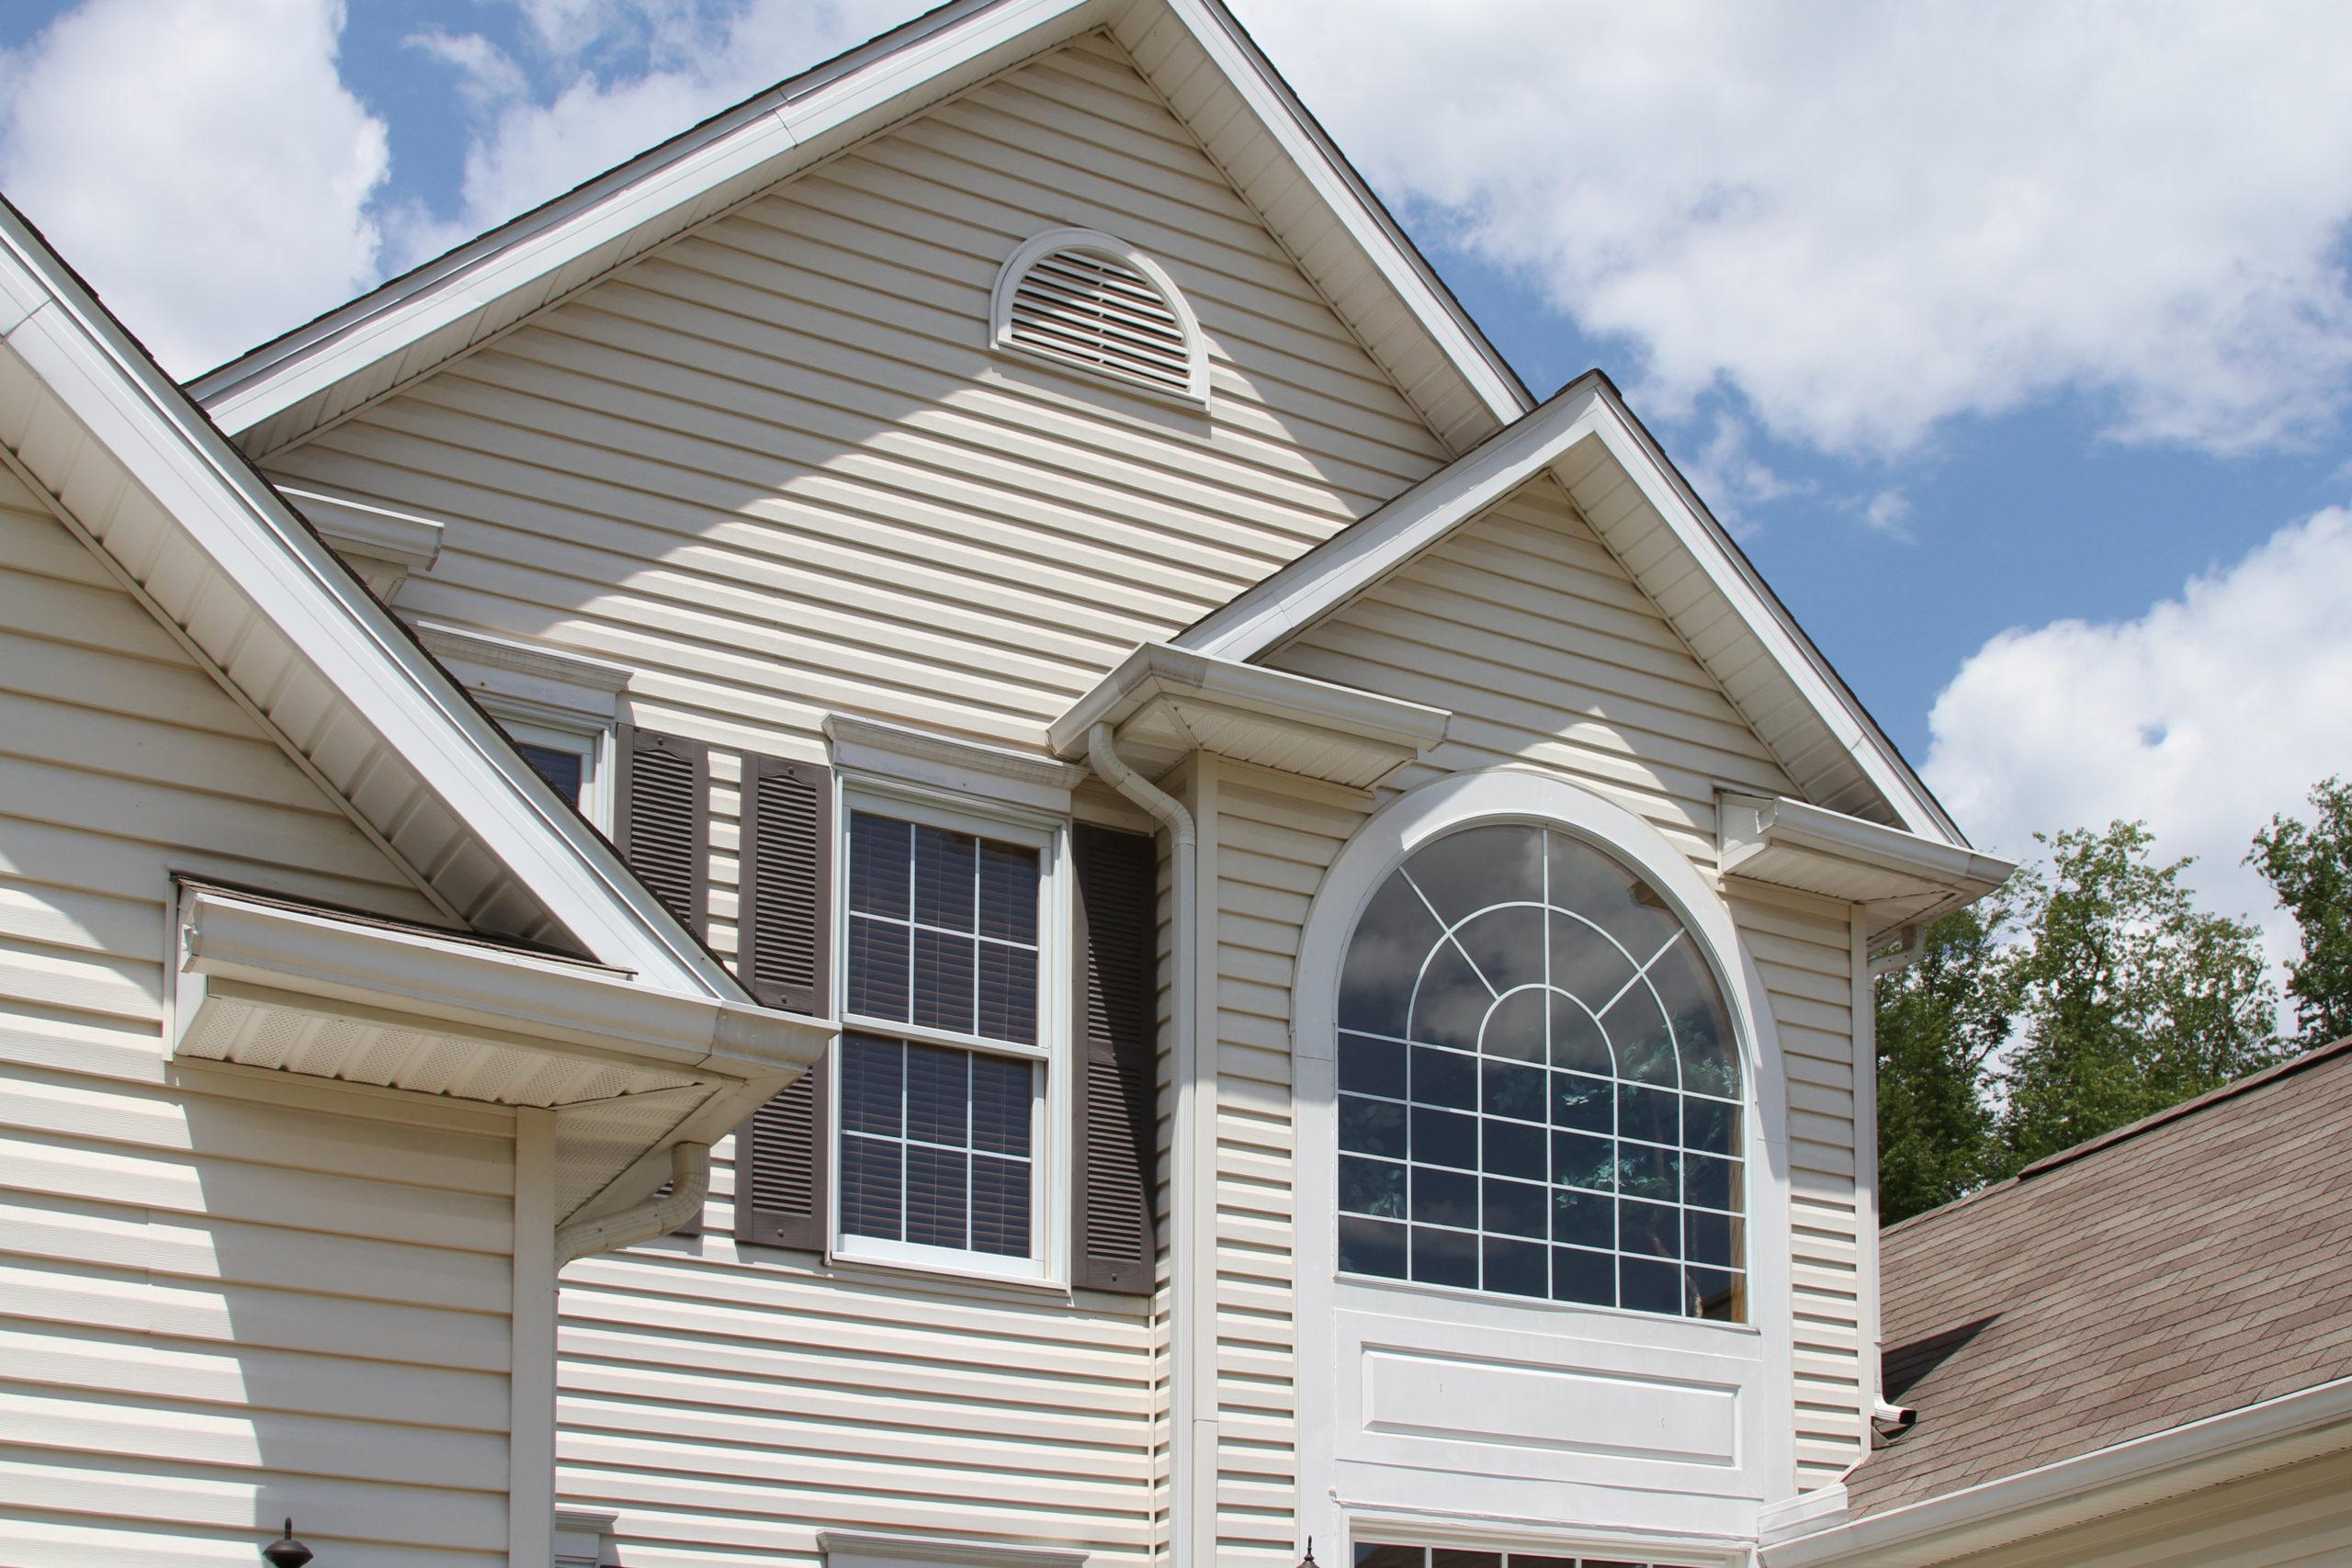 denver commercial roofing company serving the front range